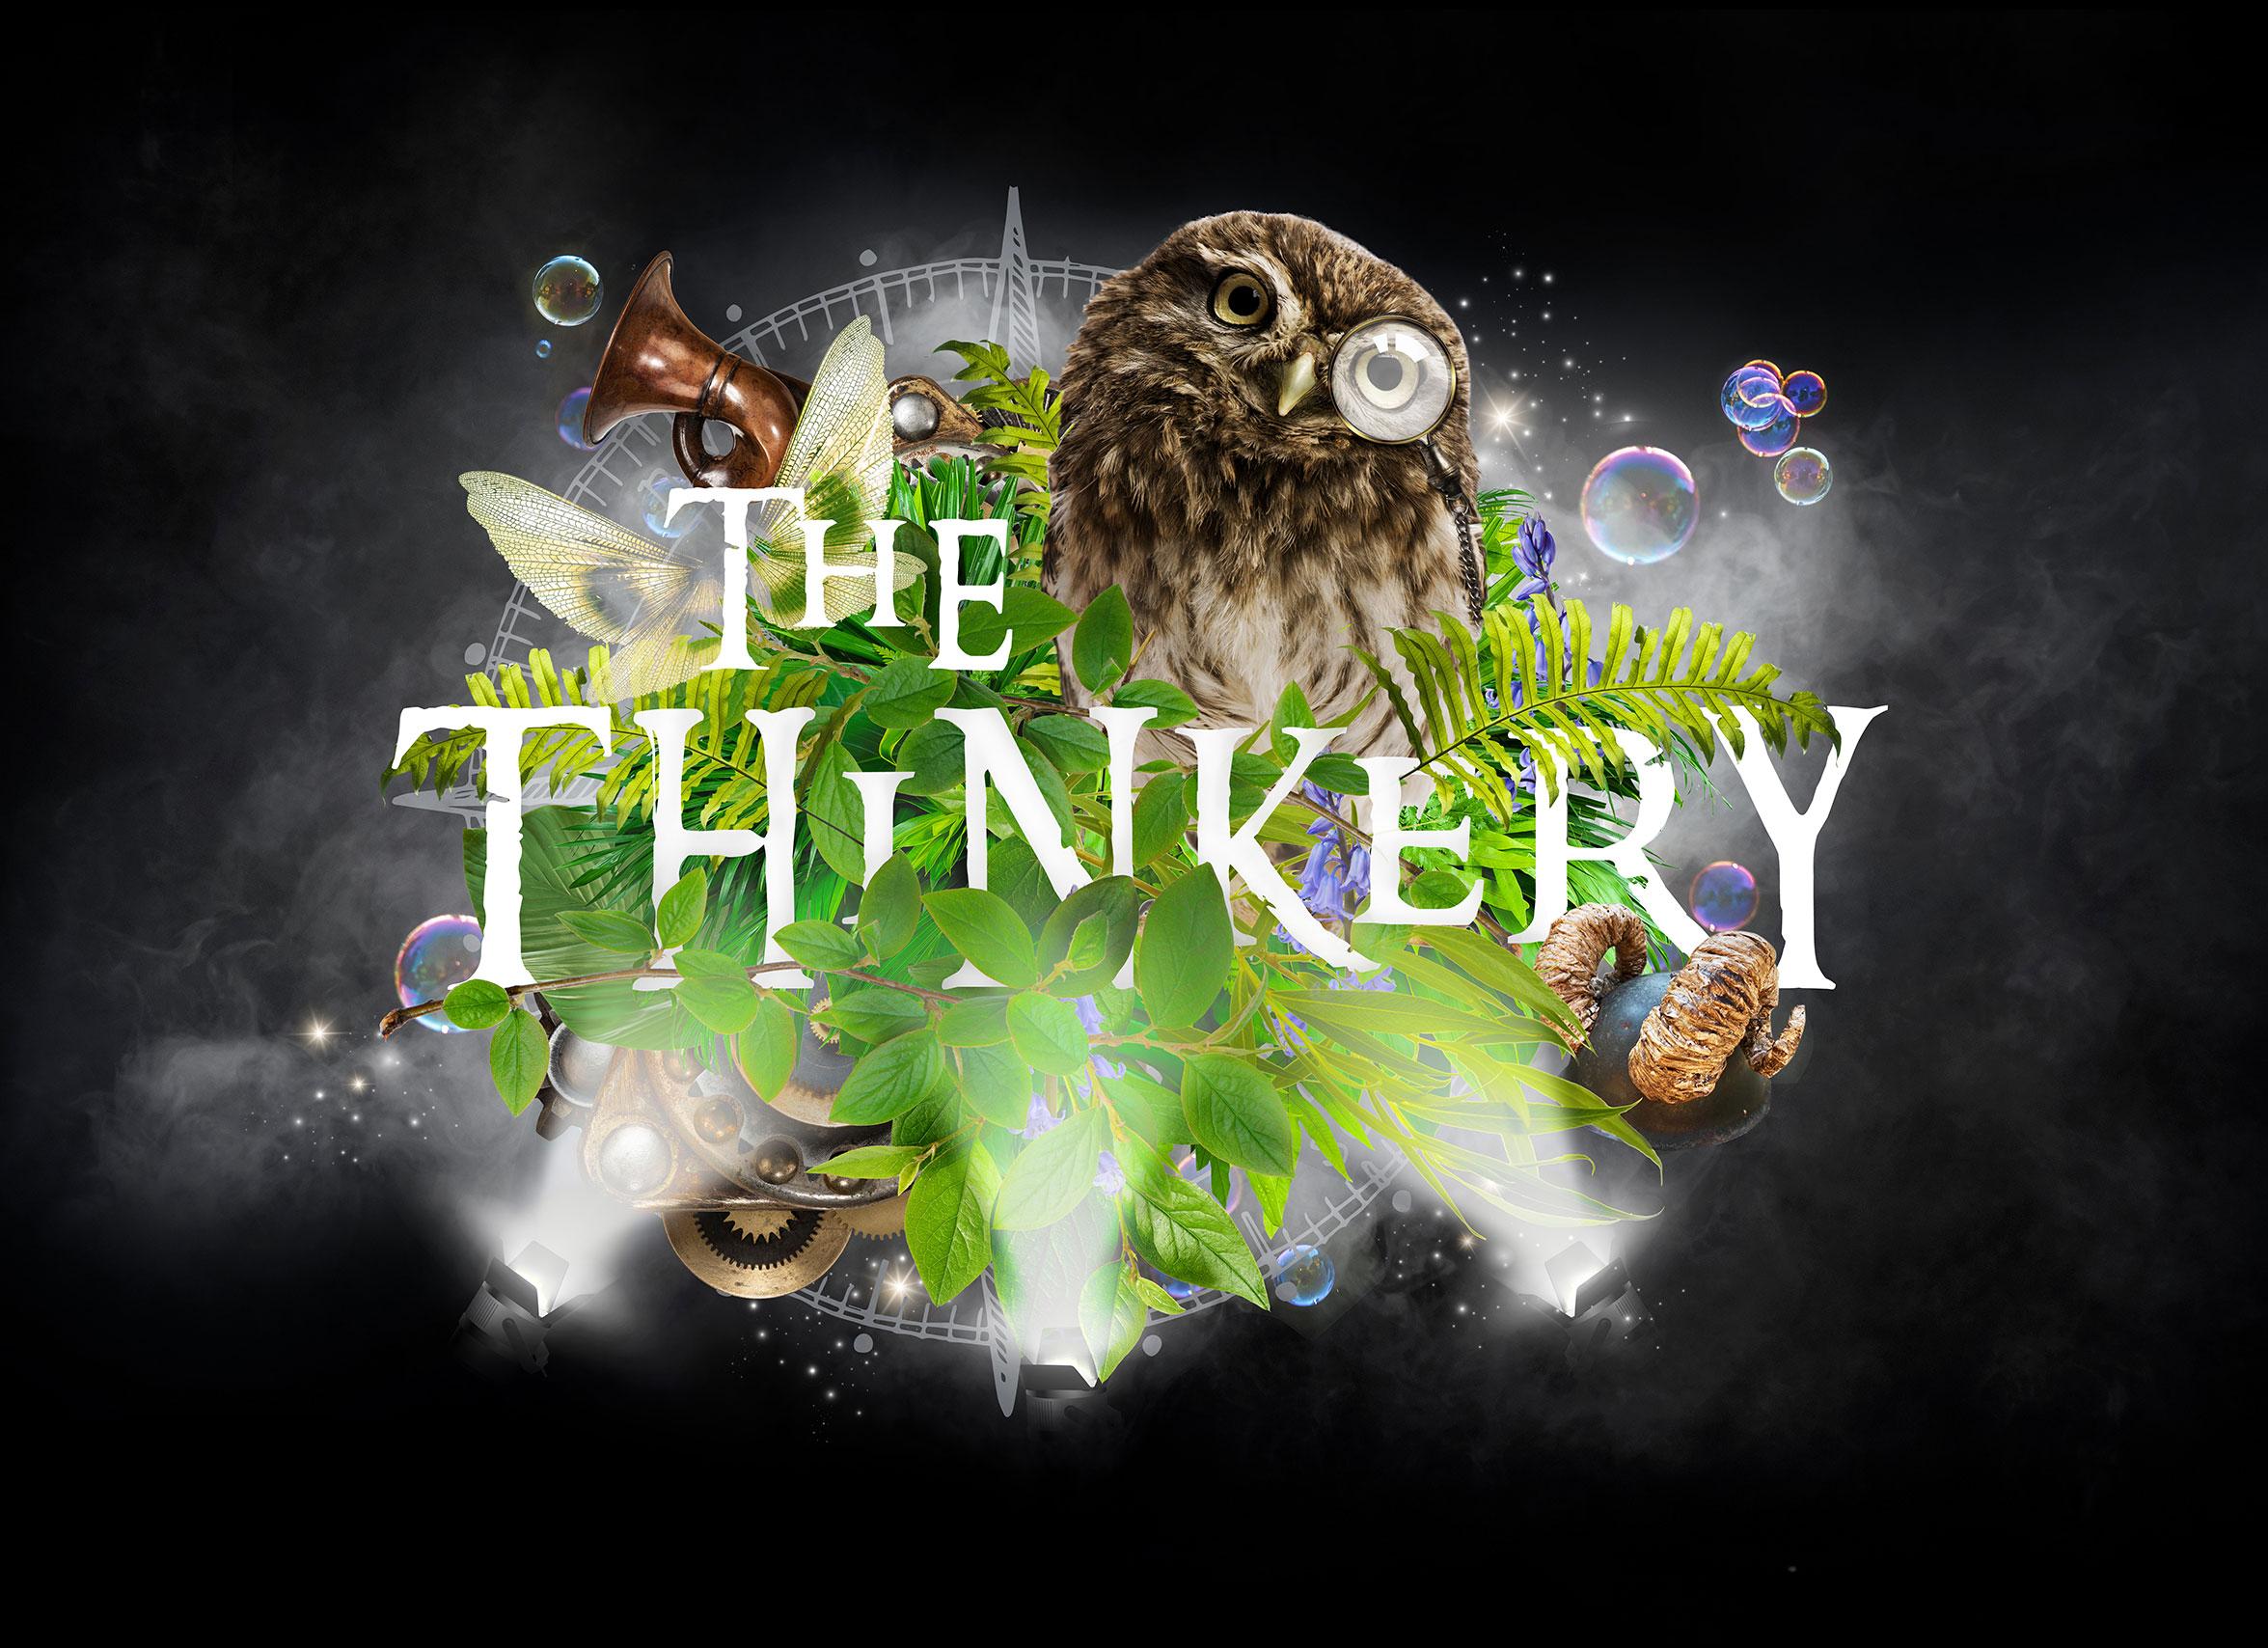 The Thinkery sub brand logo design